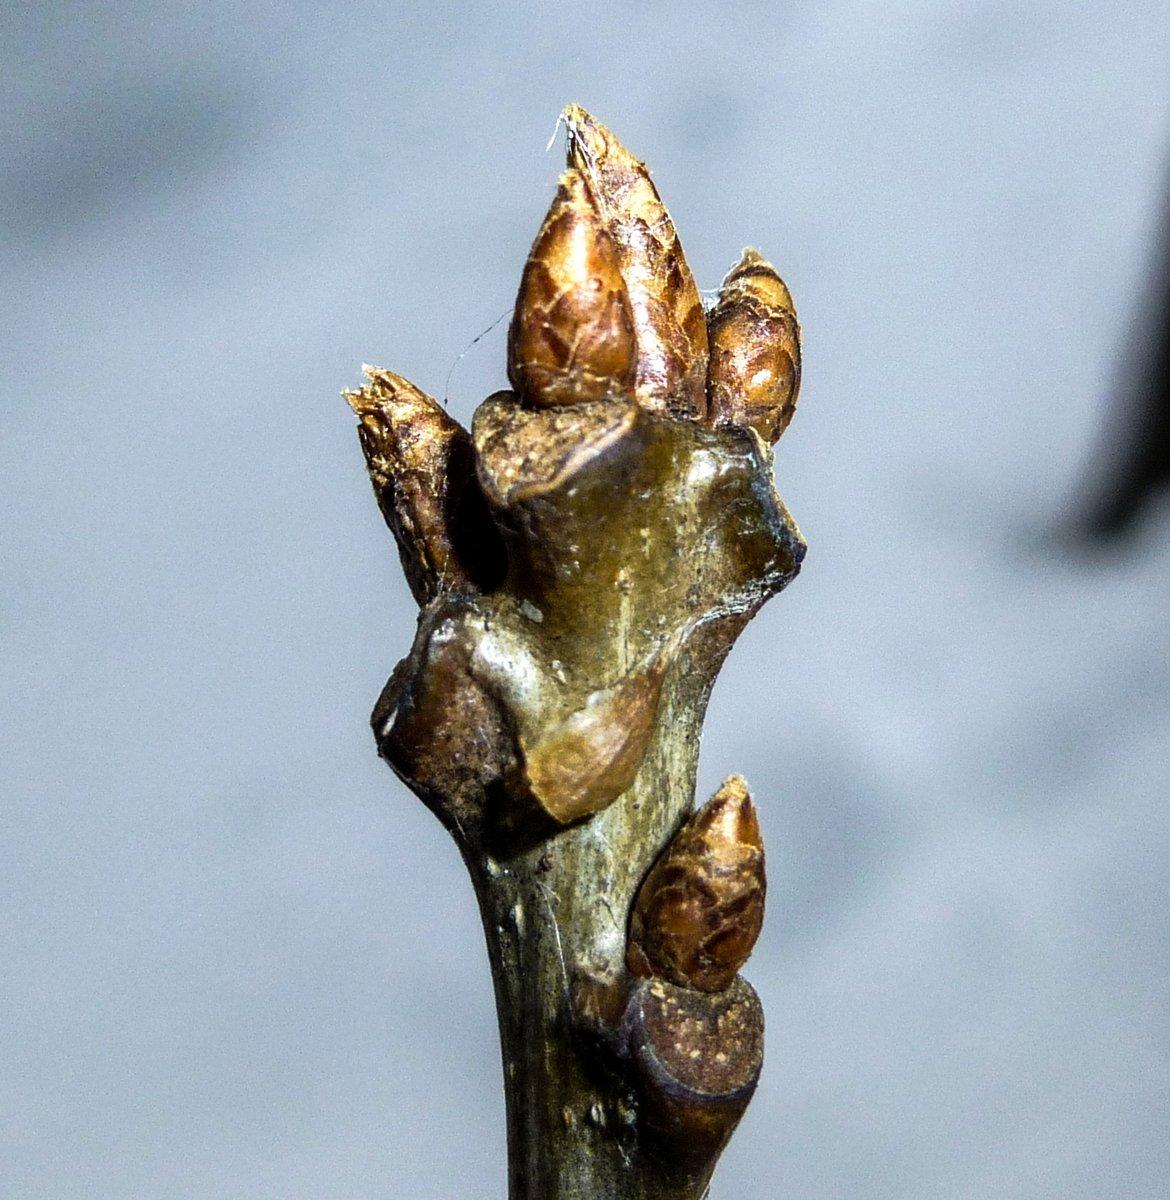 9. Red Oak Buds